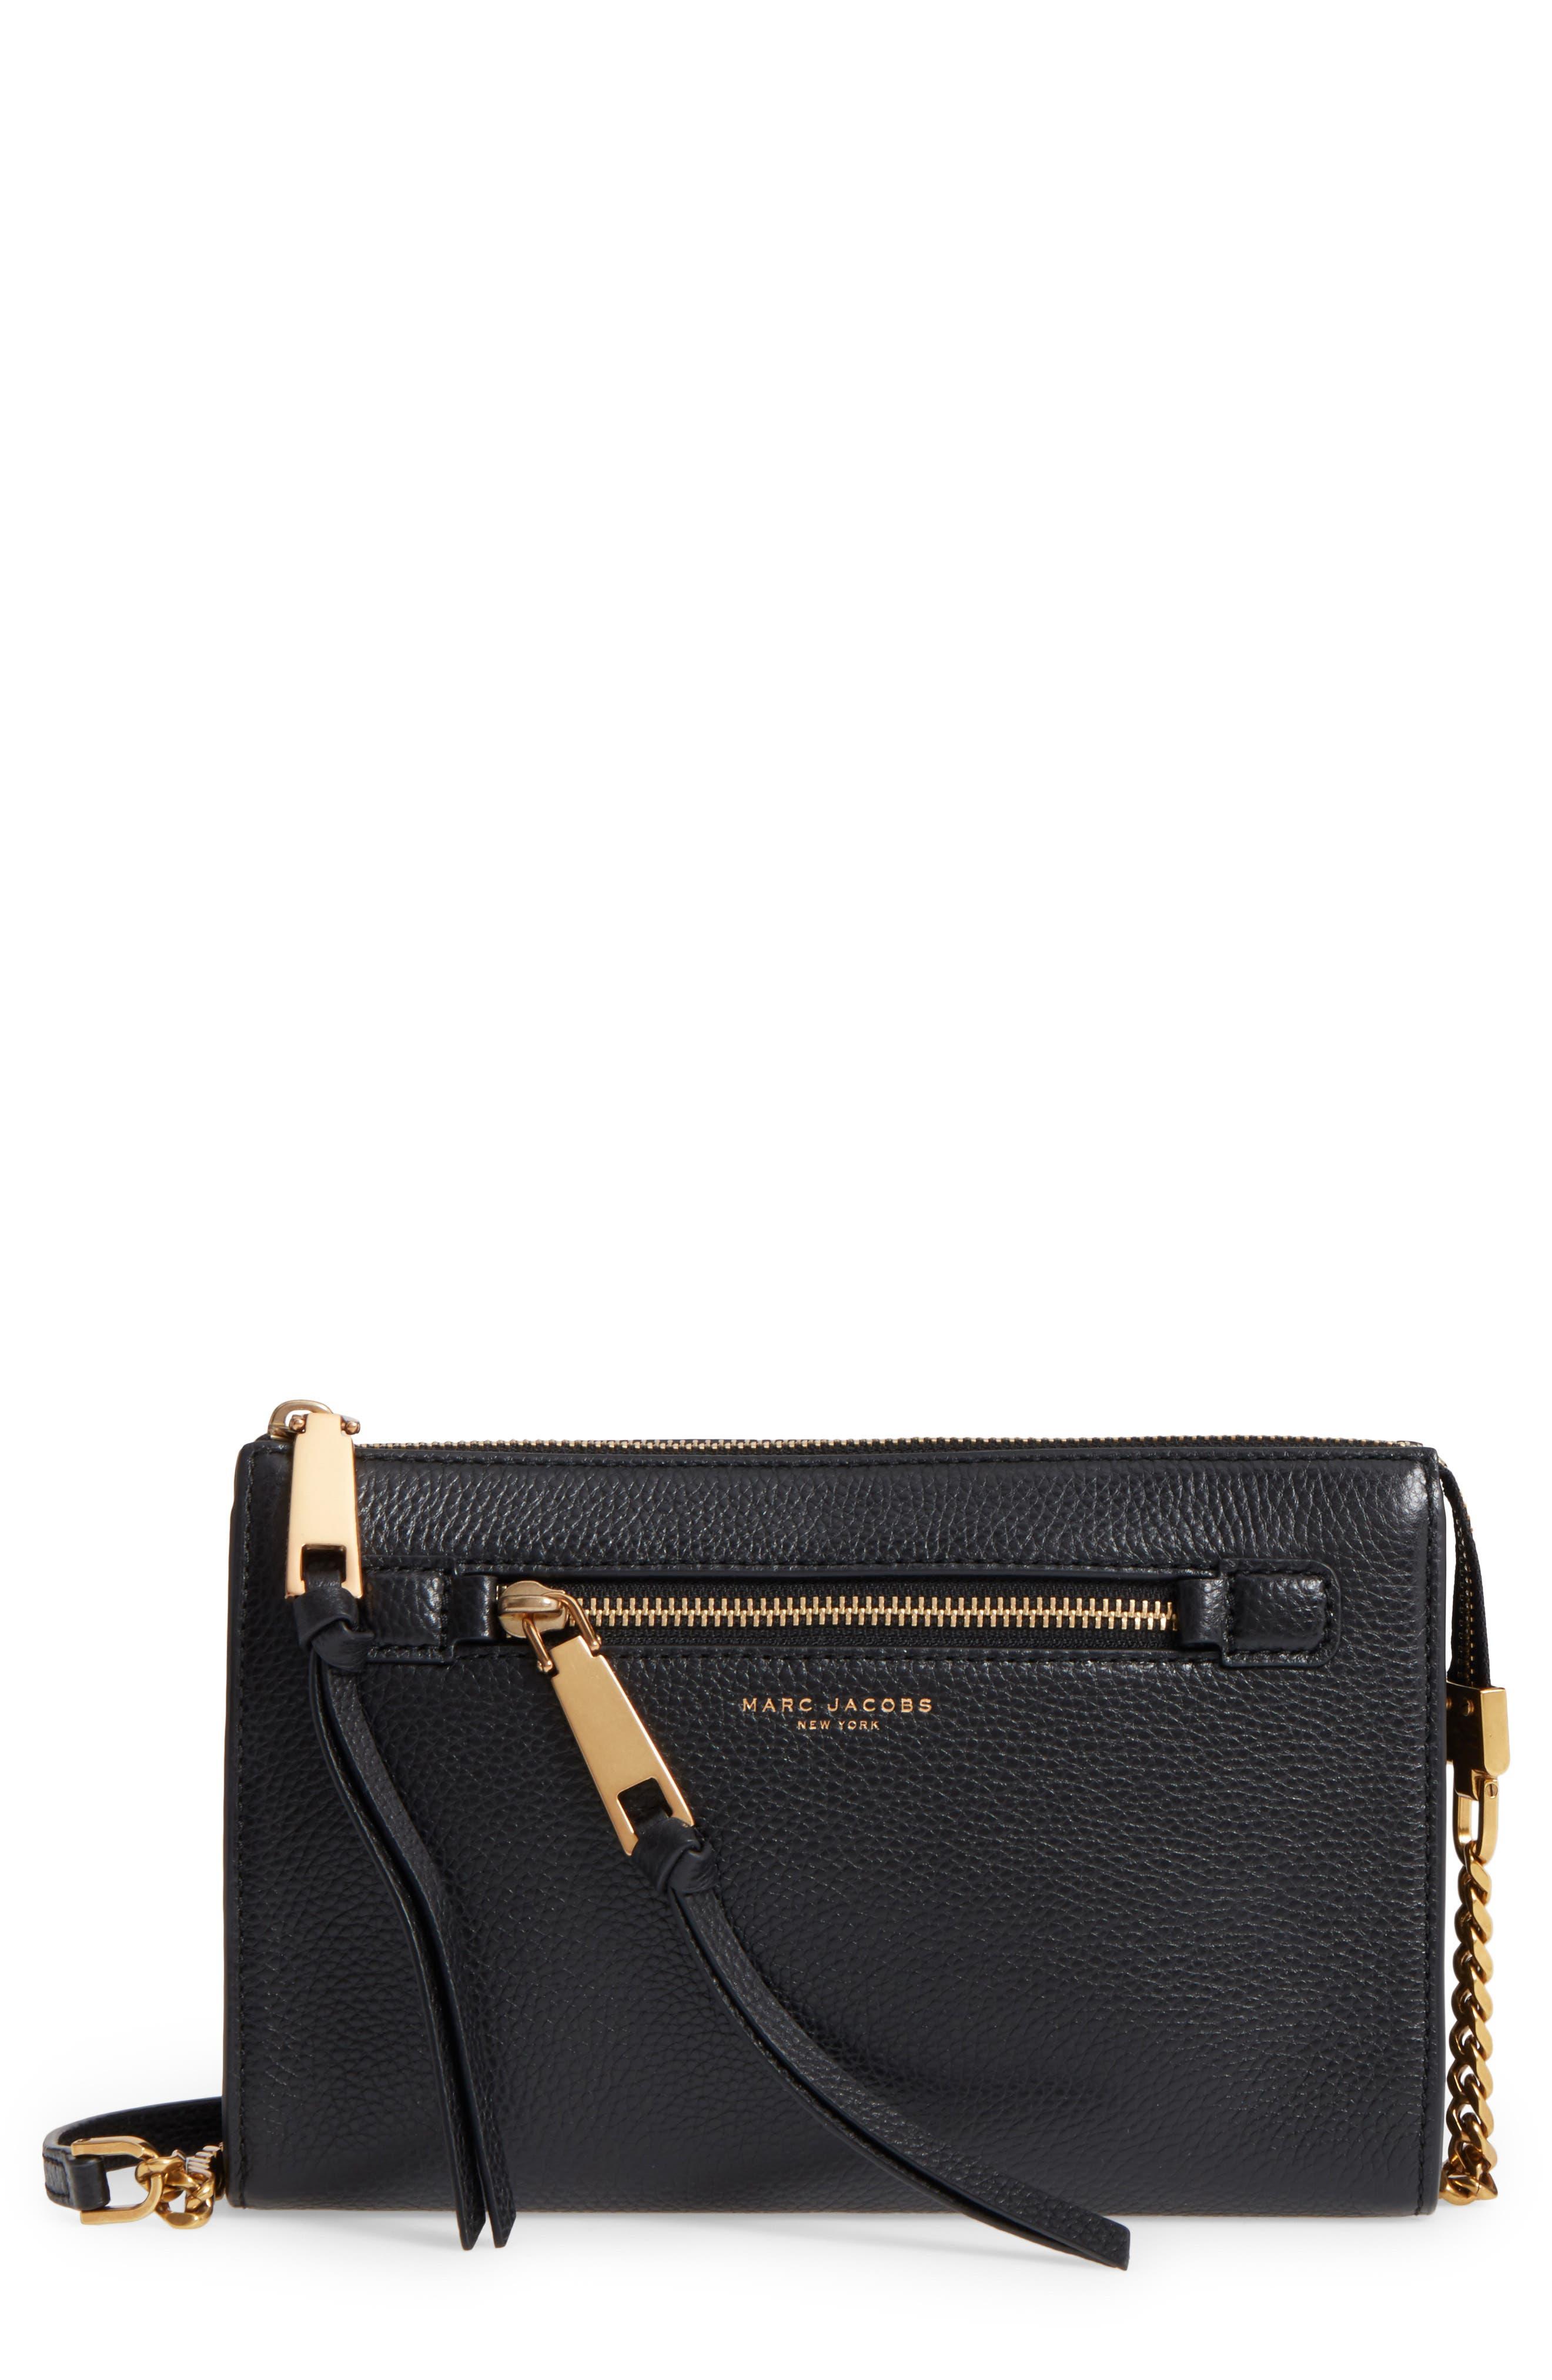 Small Recruit Leather Crossbody Bag,                             Main thumbnail 1, color,                             001